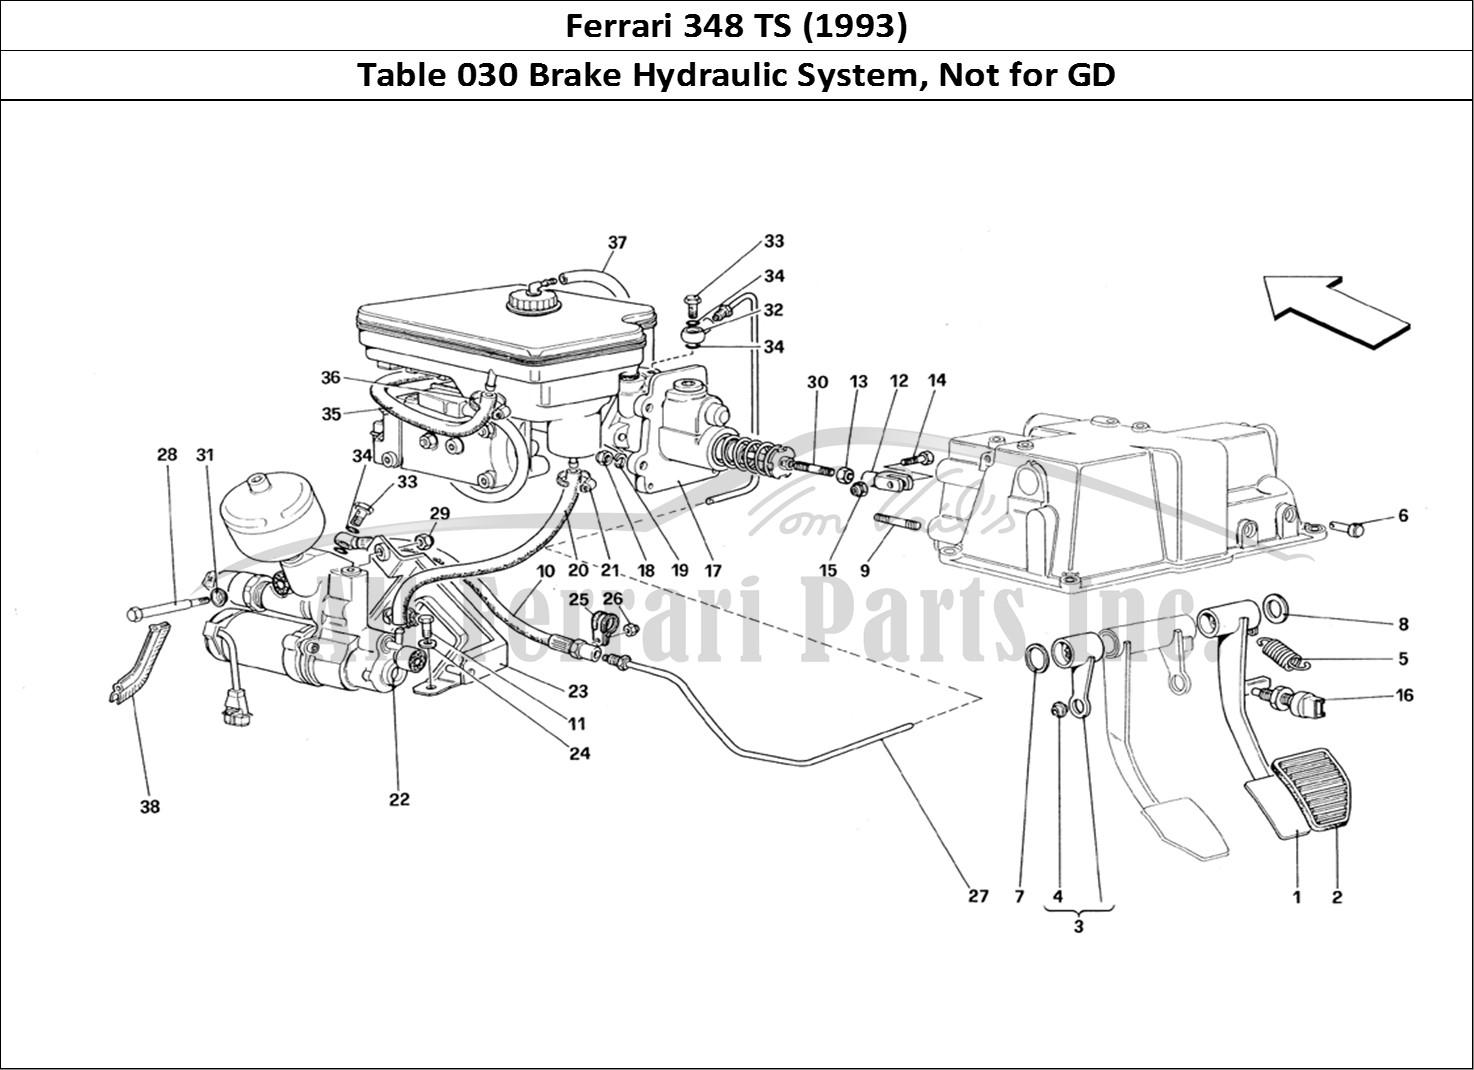 Buy Original Ferrari 348 Ts 030 Brake Hydraulic System Not For Gd Ferrari Parts Spares